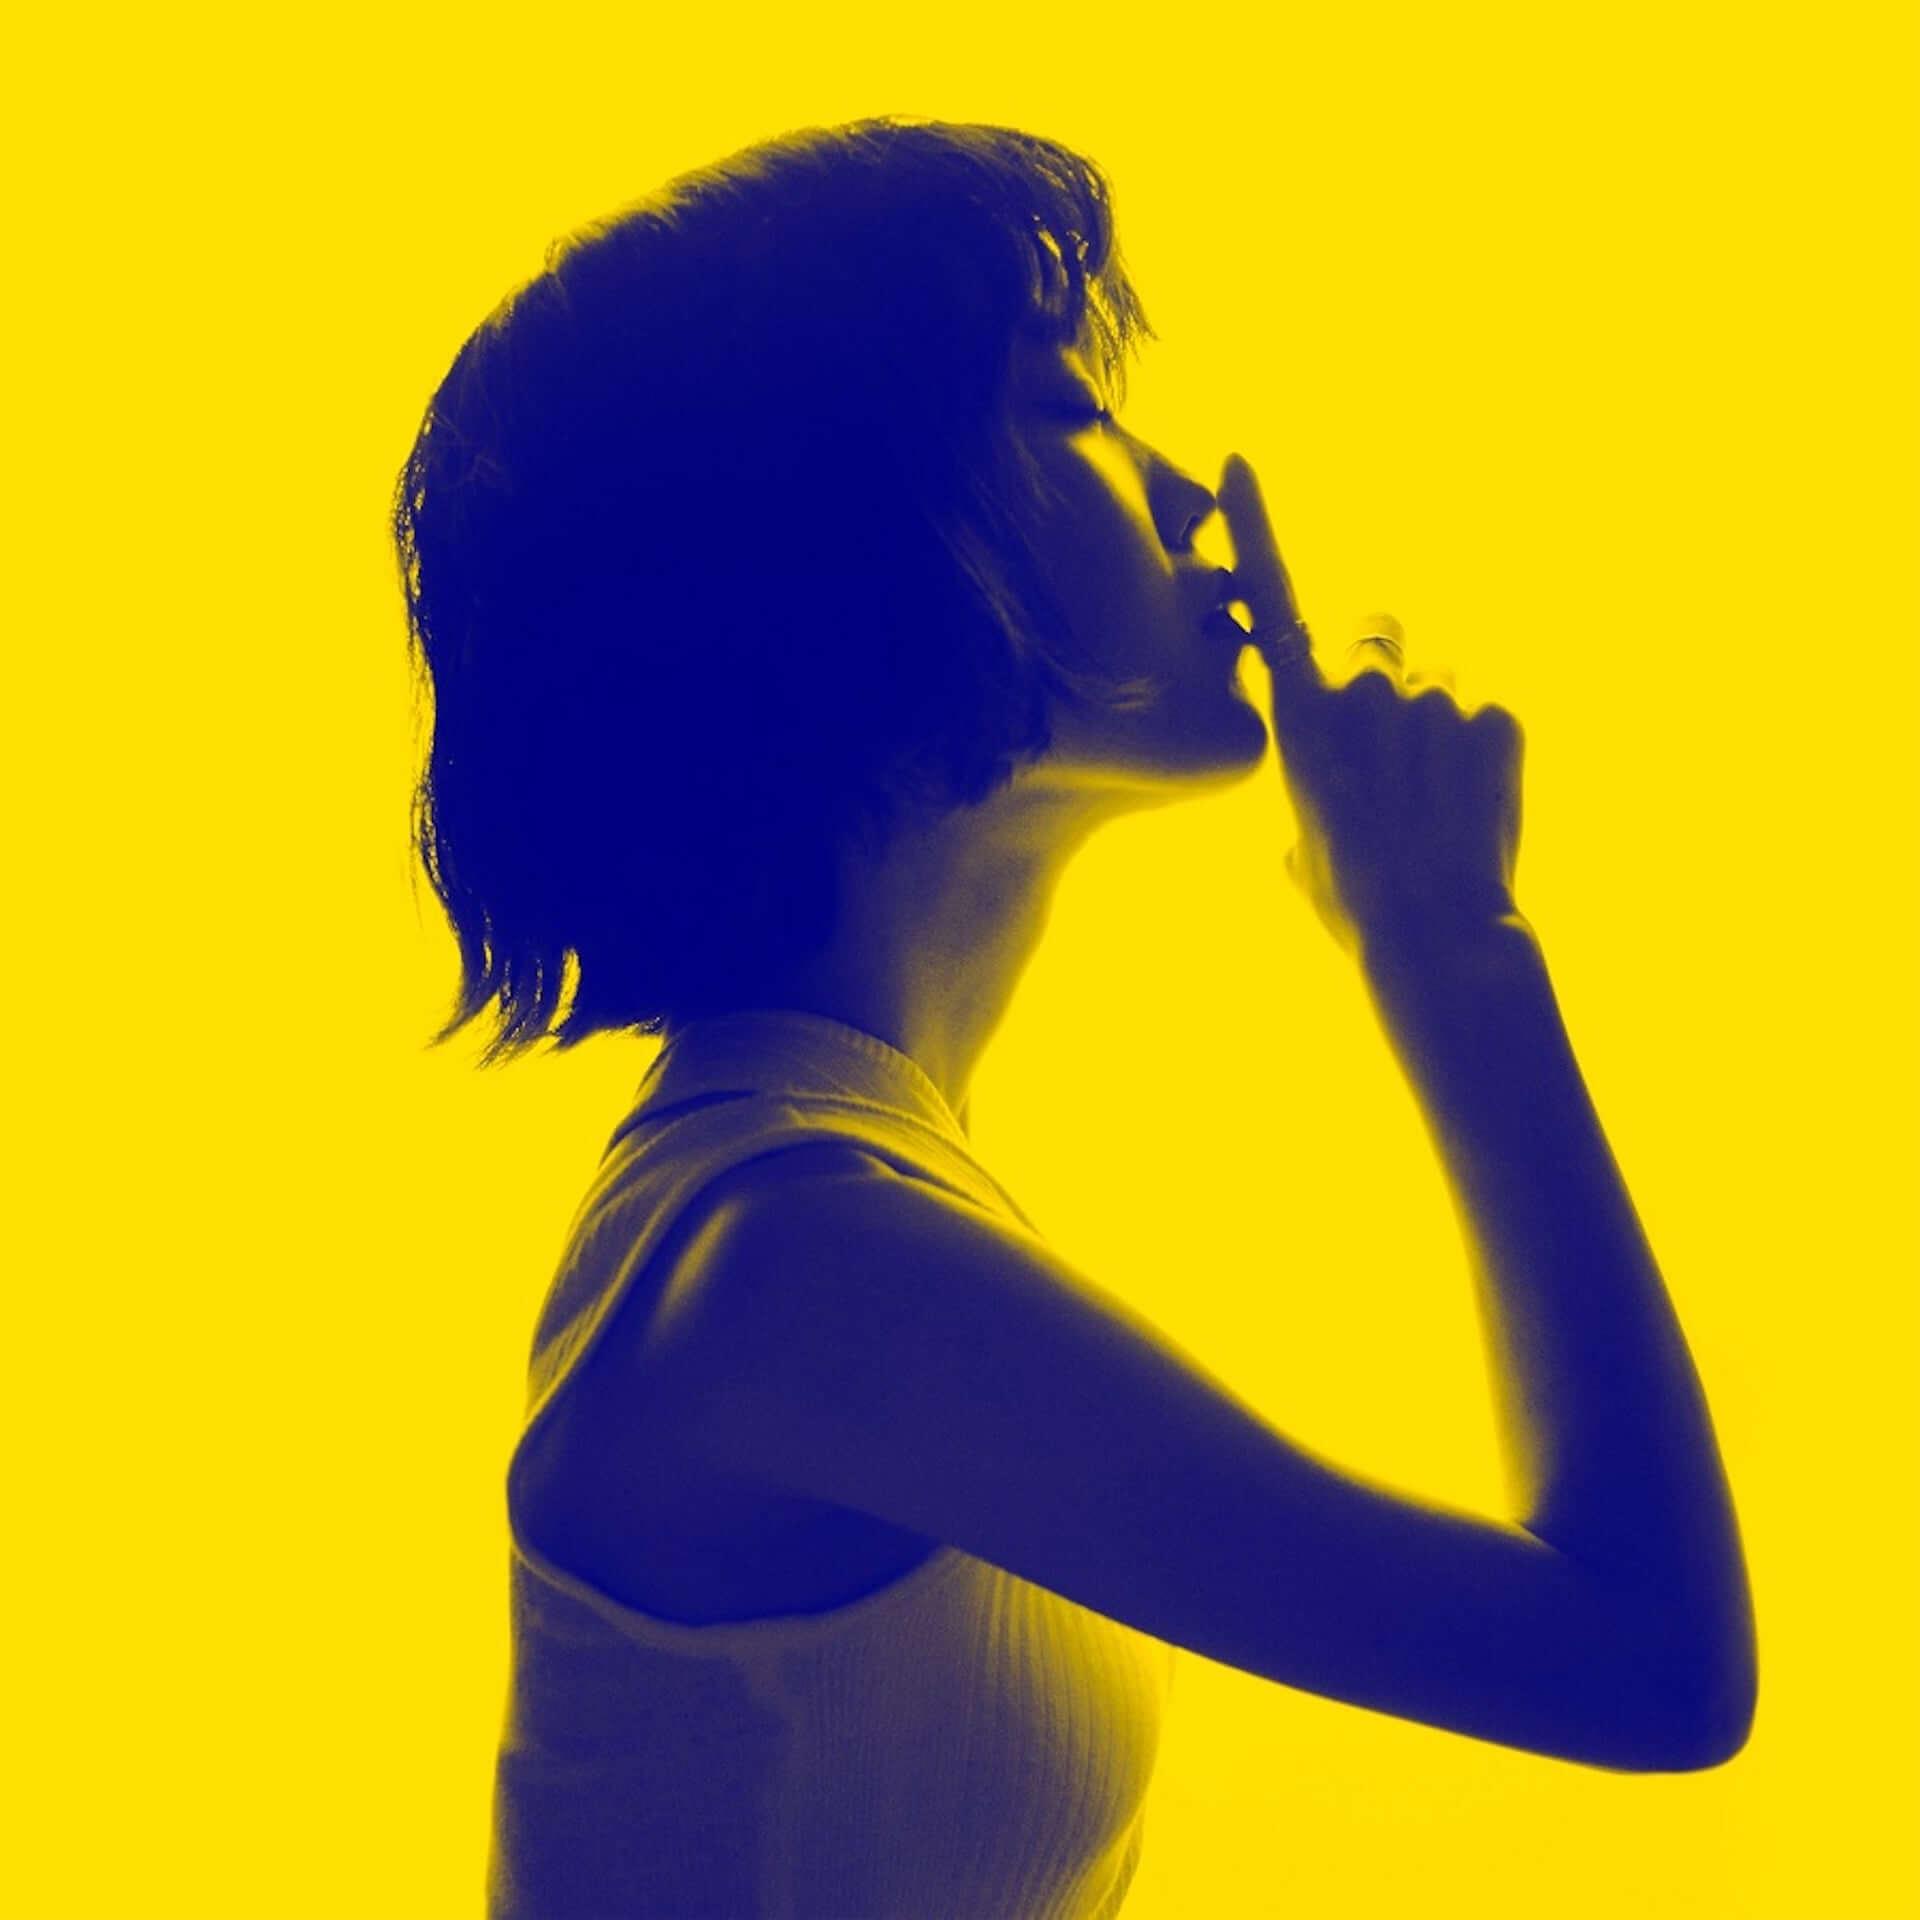 "Reiの2ndアルバム『HONEY』が発売決定!SOIL&""PIMP""SESSIONSとのコラボ曲も収録 music201009_rei_2-1920x1920"